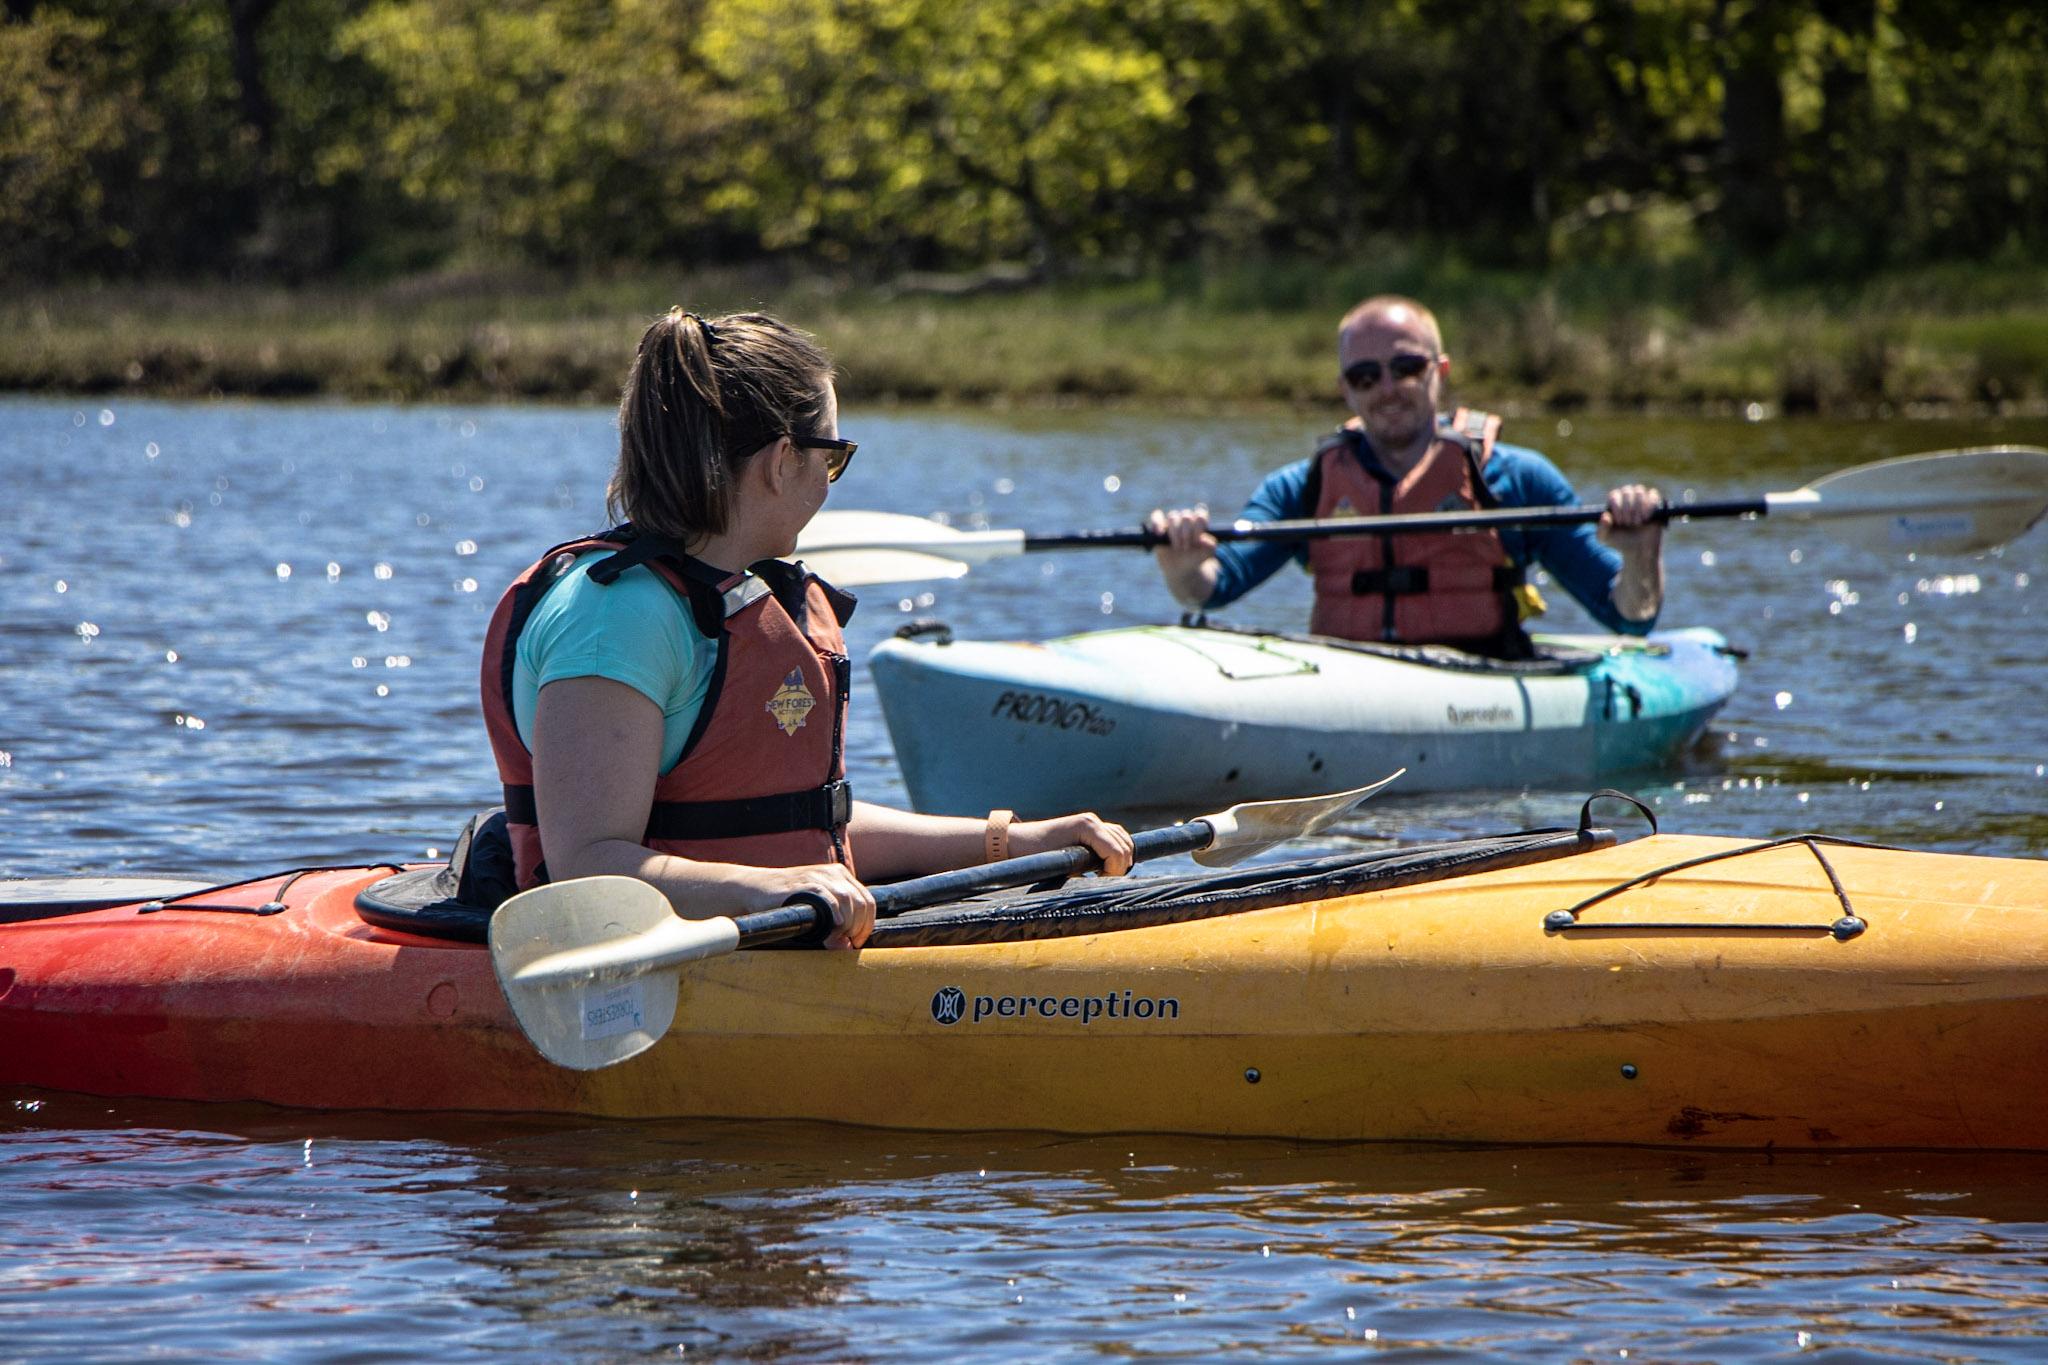 A couple enjoying a guided kayaking tour on the Beaulieu River.